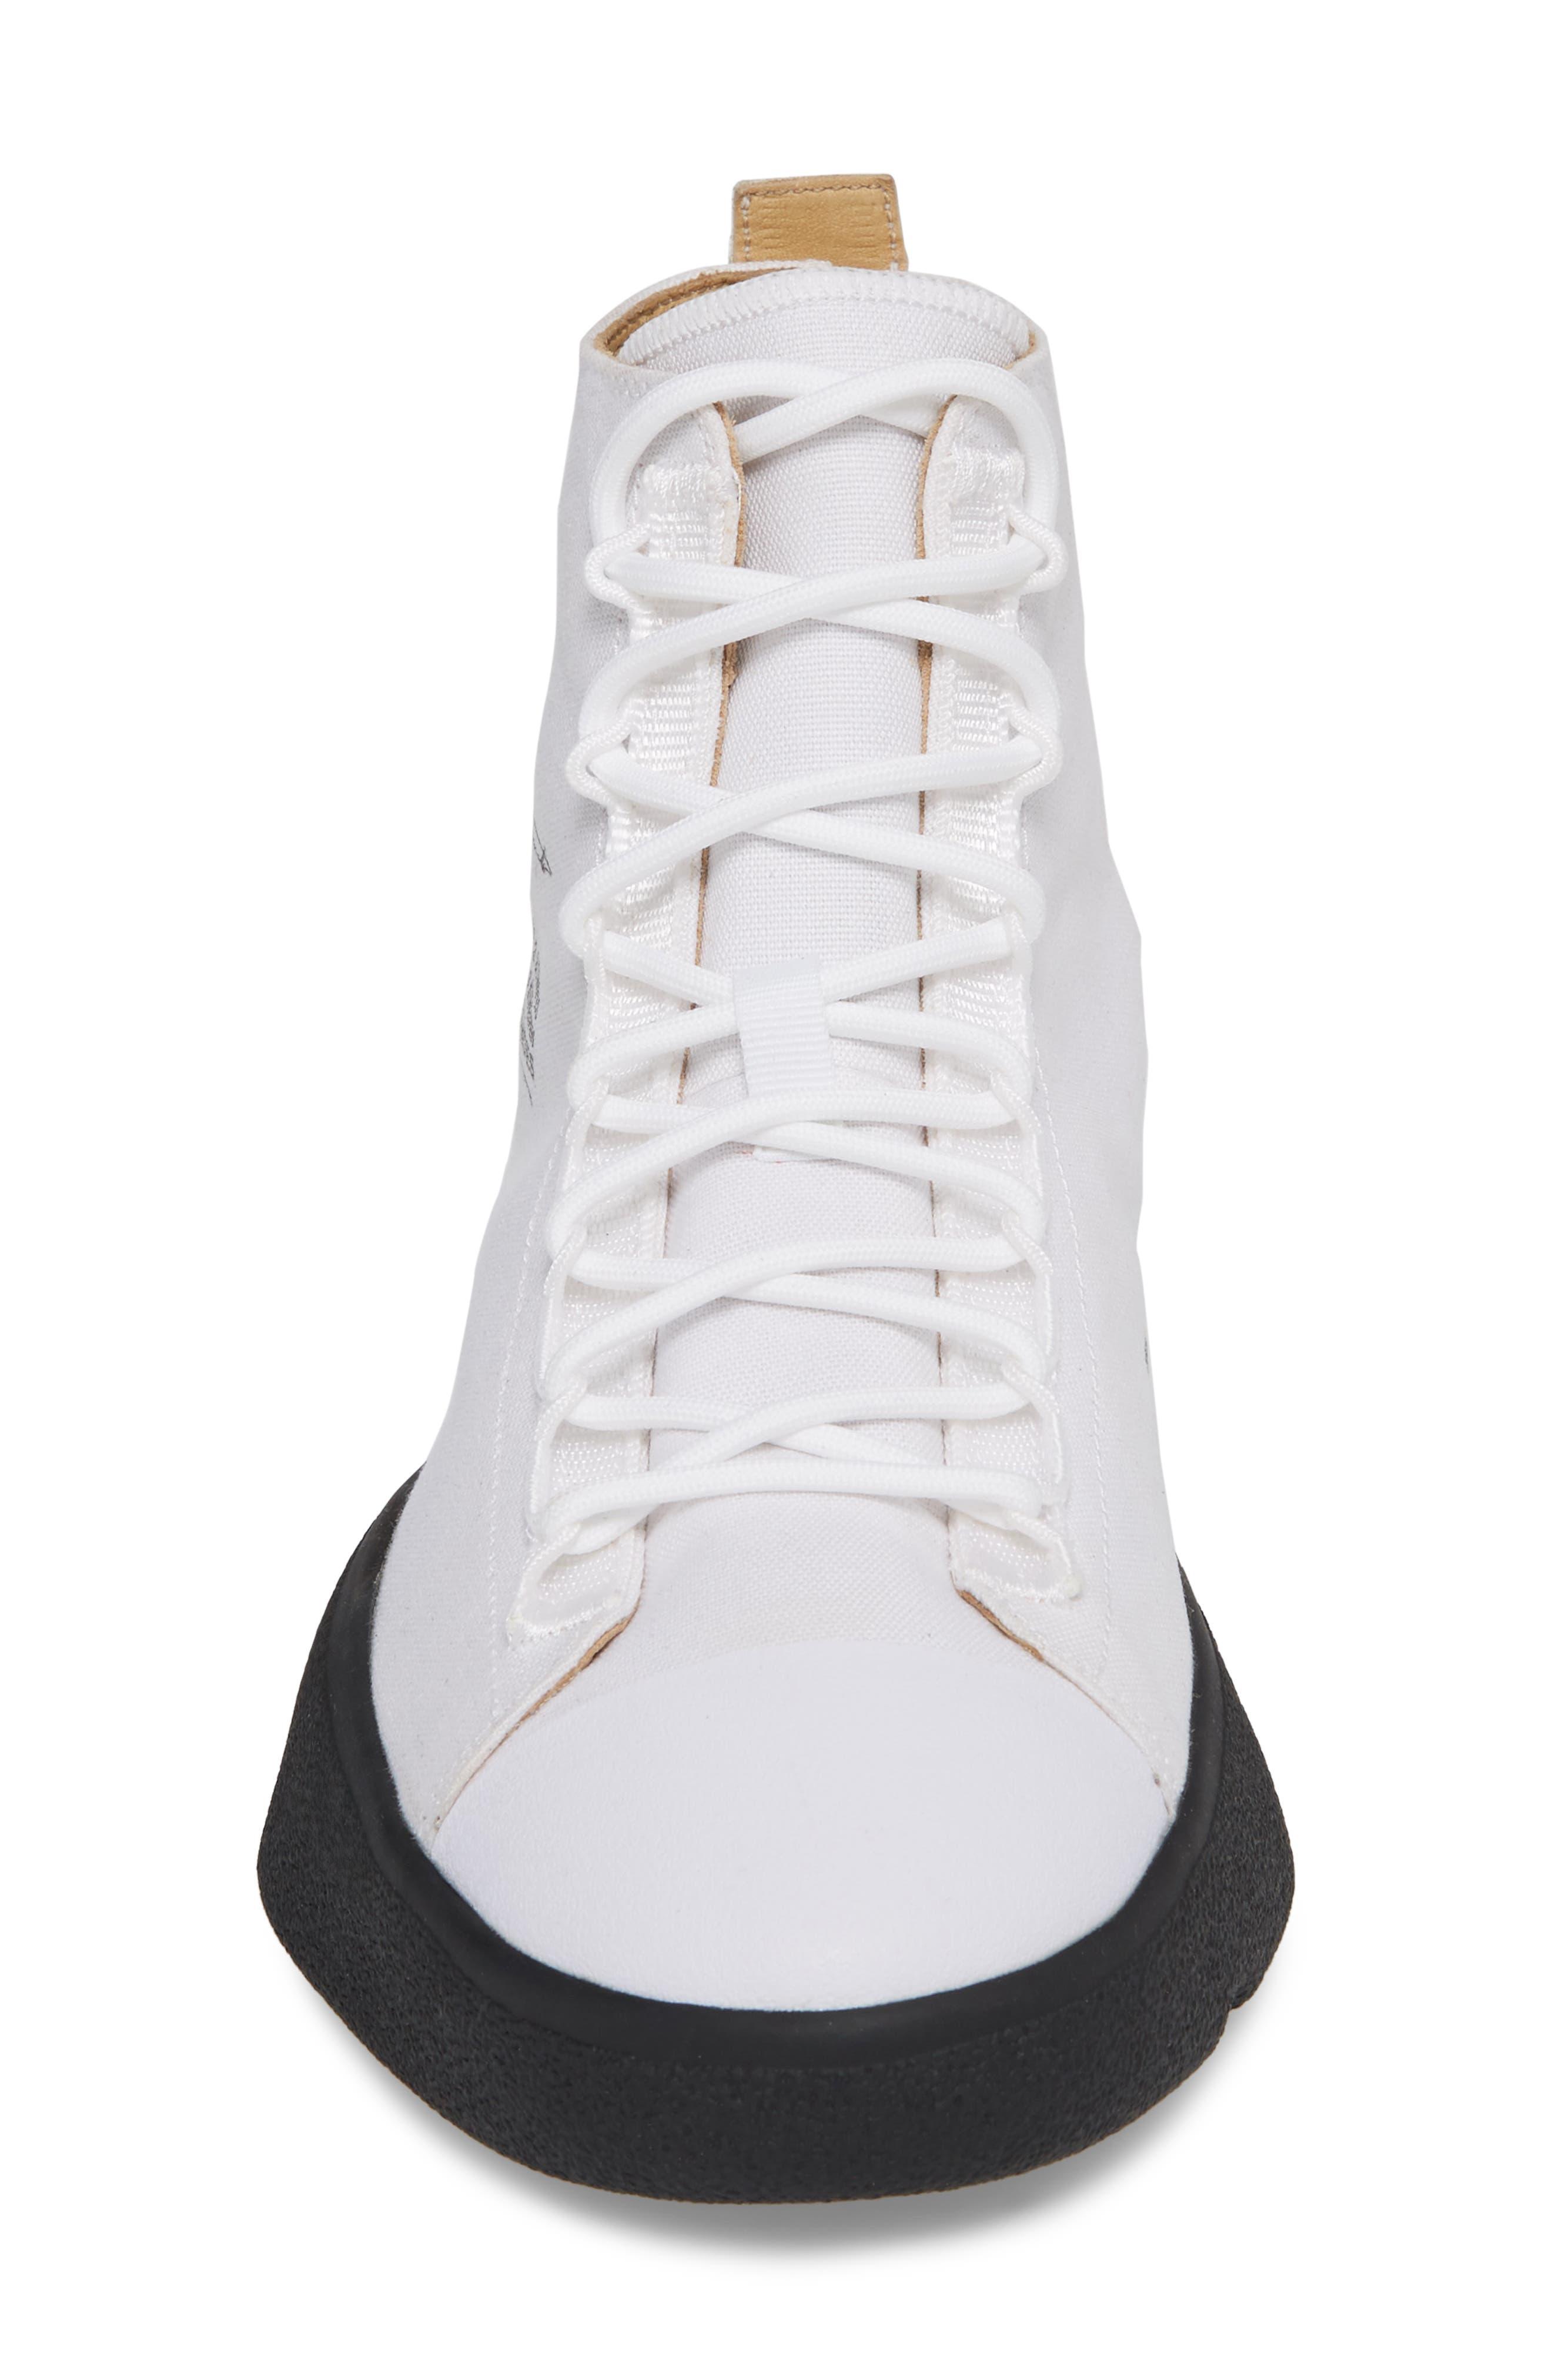 Bashyo High Top Sneaker,                             Alternate thumbnail 4, color,                             White/ Black